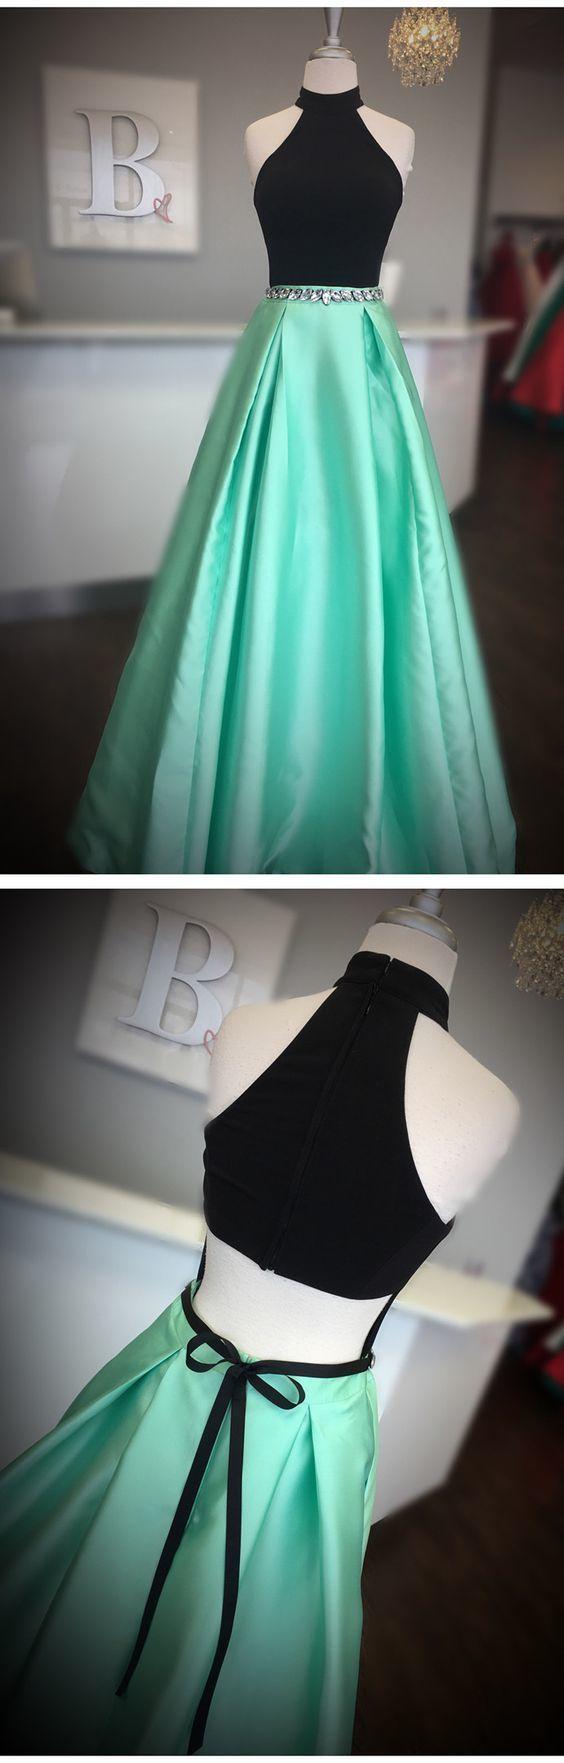 Elegant A Line Prom Dress, Long Evening Dress, High Neck Homecoming Dress